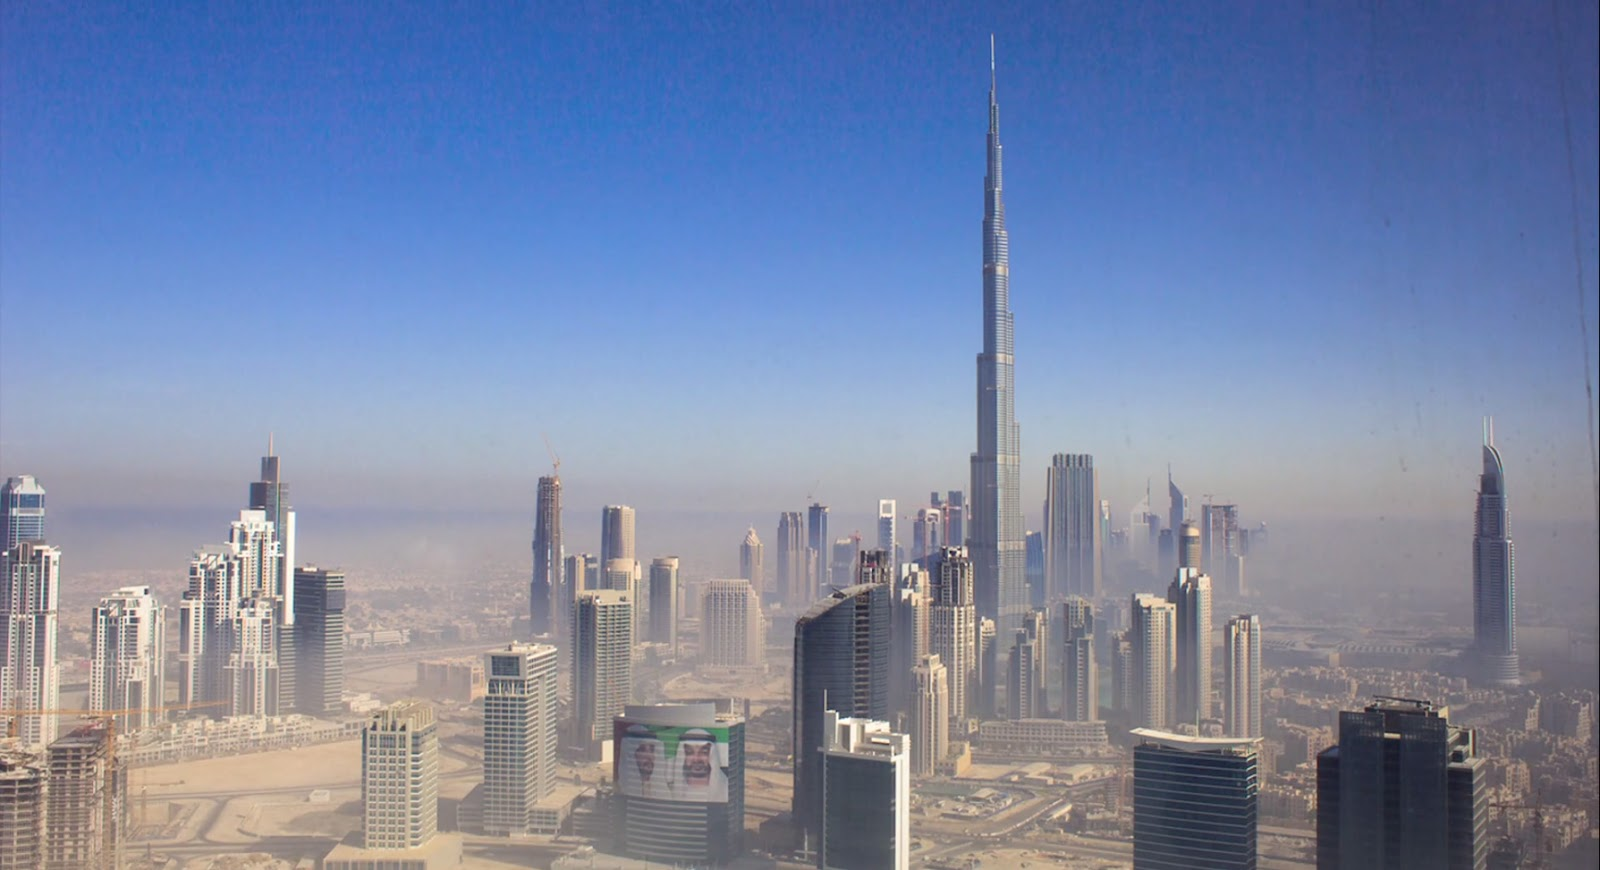 Burj Khalifa – 828 m (Emirados Árabes Unidos)